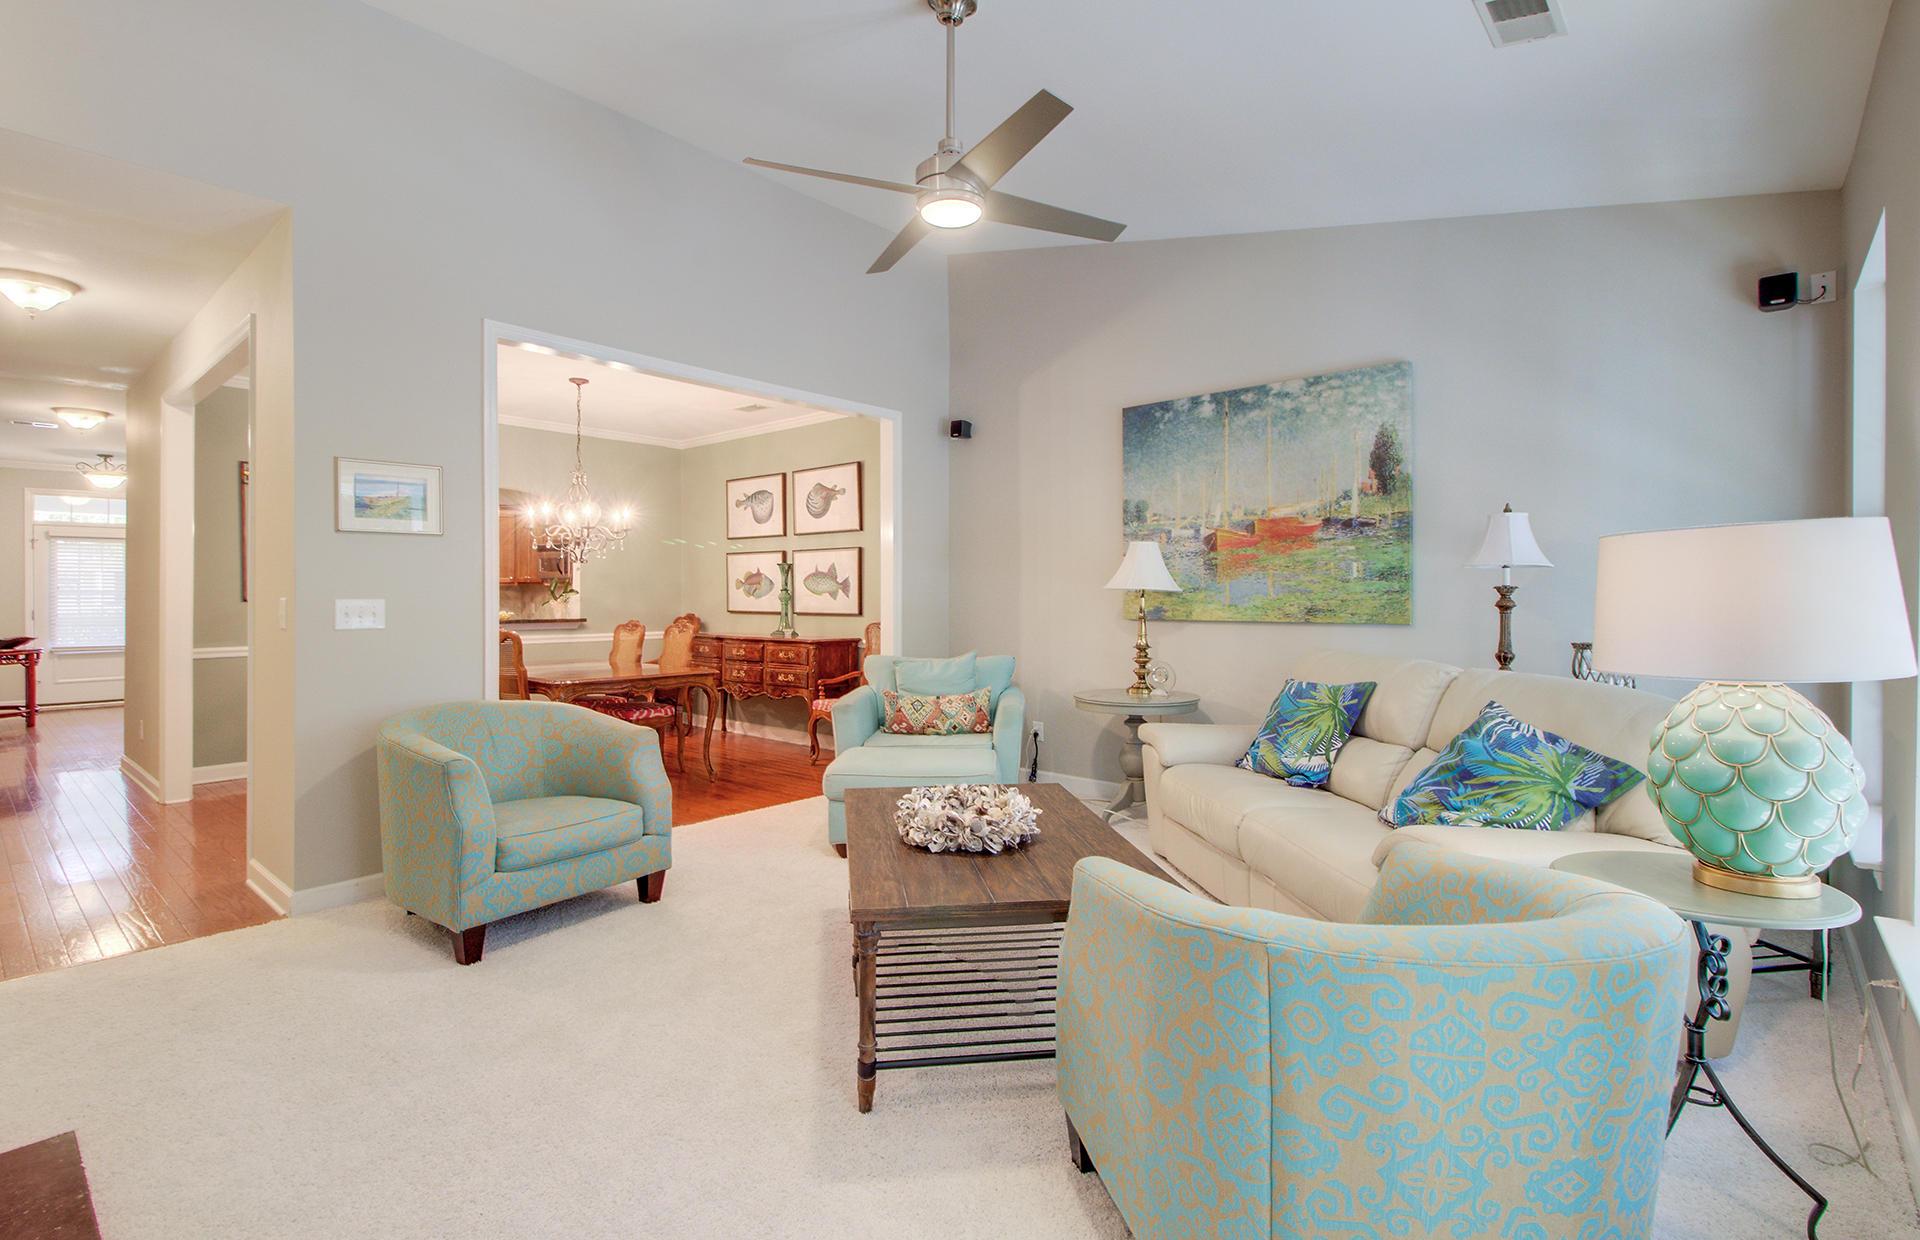 Dunes West Homes For Sale - 145 Fresh Meadow, Mount Pleasant, SC - 17